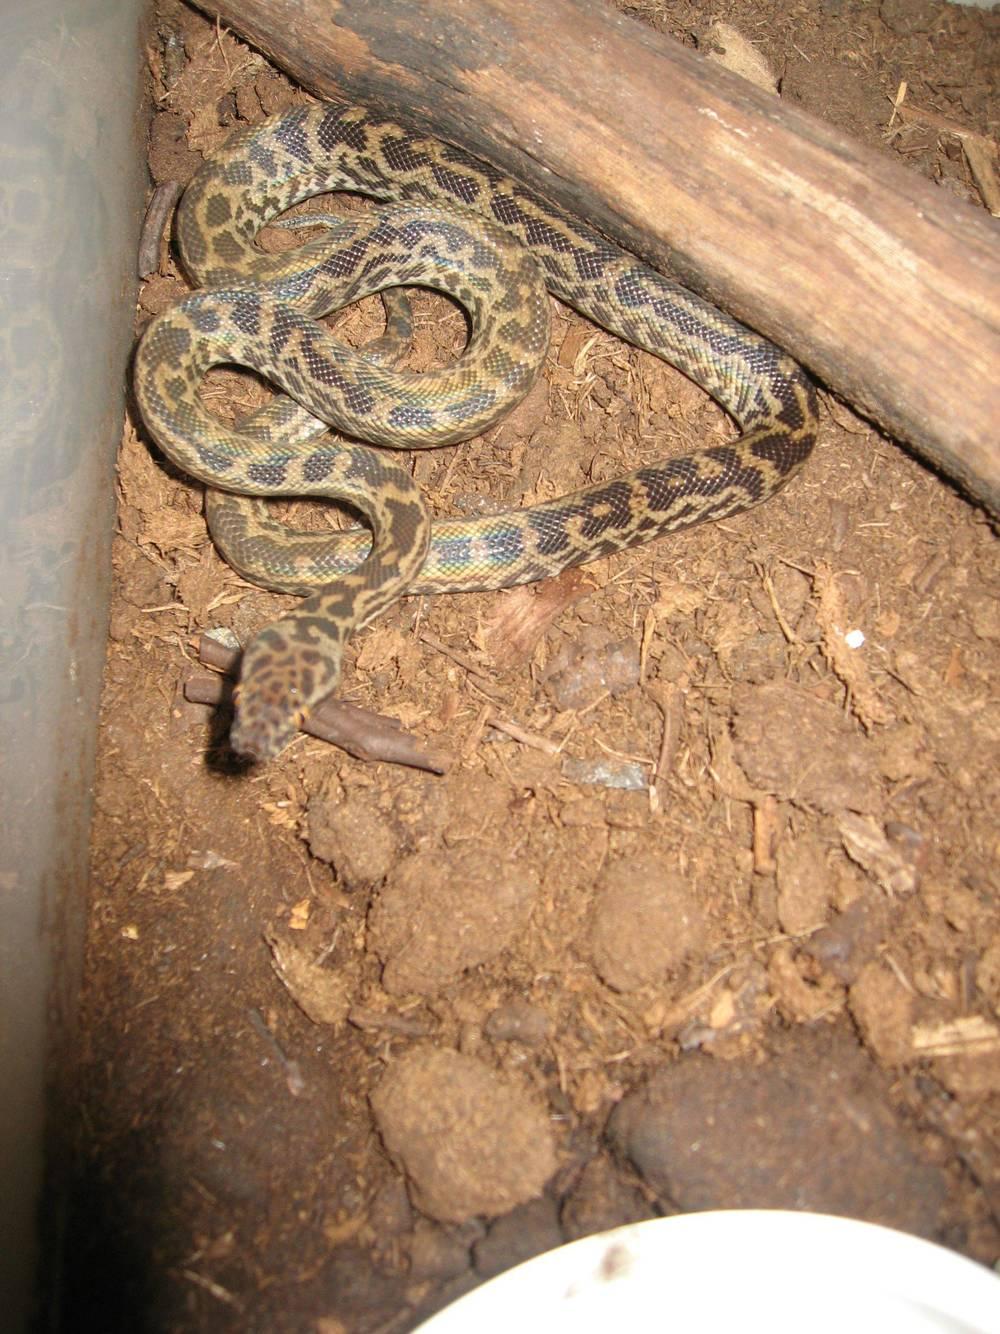 07 - Spotted python.jpg